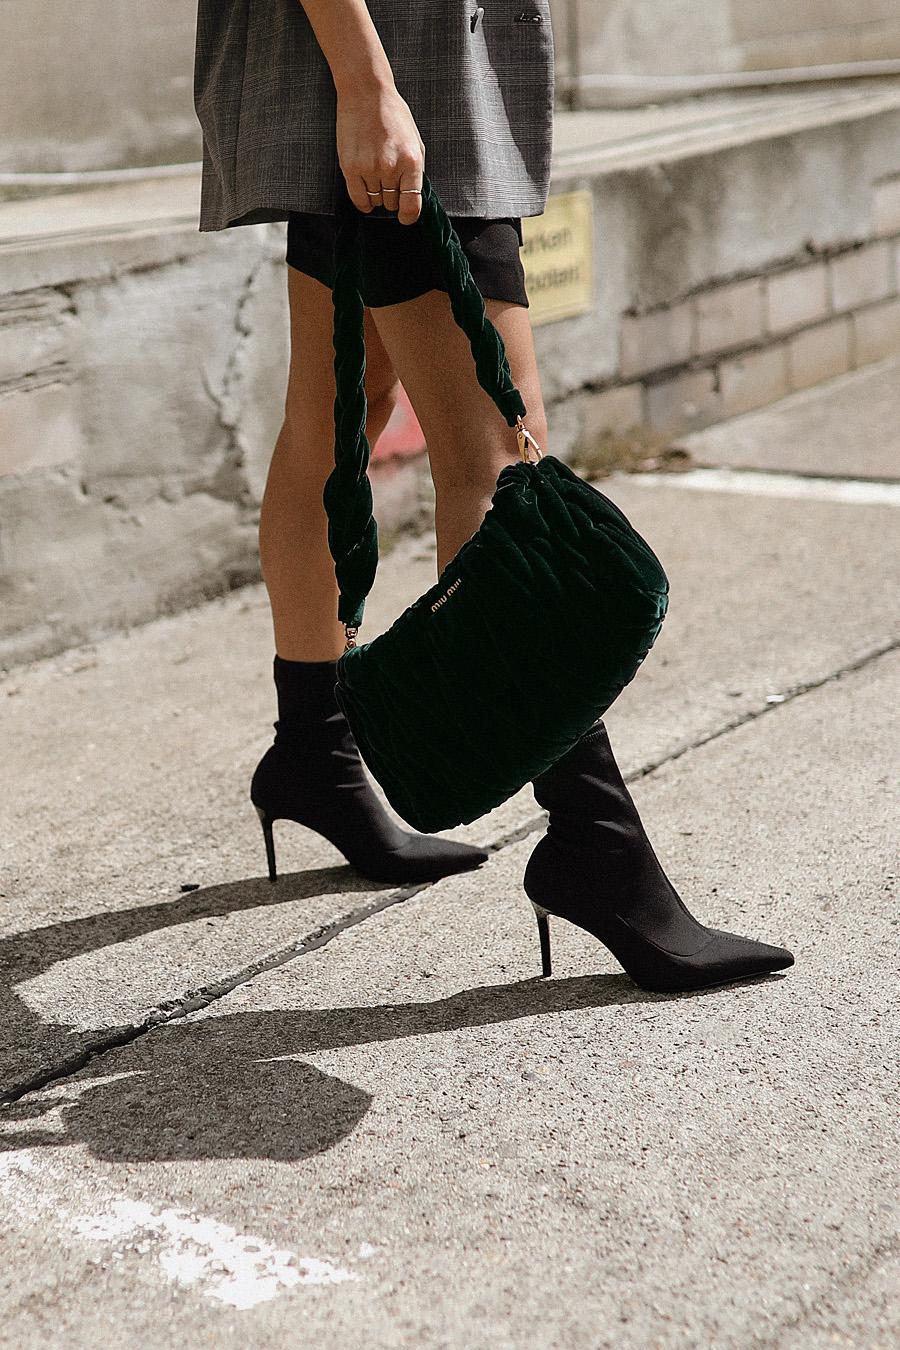 Outfit: Céline Sunglasses, Checked Blazer, Stretch Heels alla Balenciaga Knife Boots, Miu Miu Velvet Bag, Print Shirt